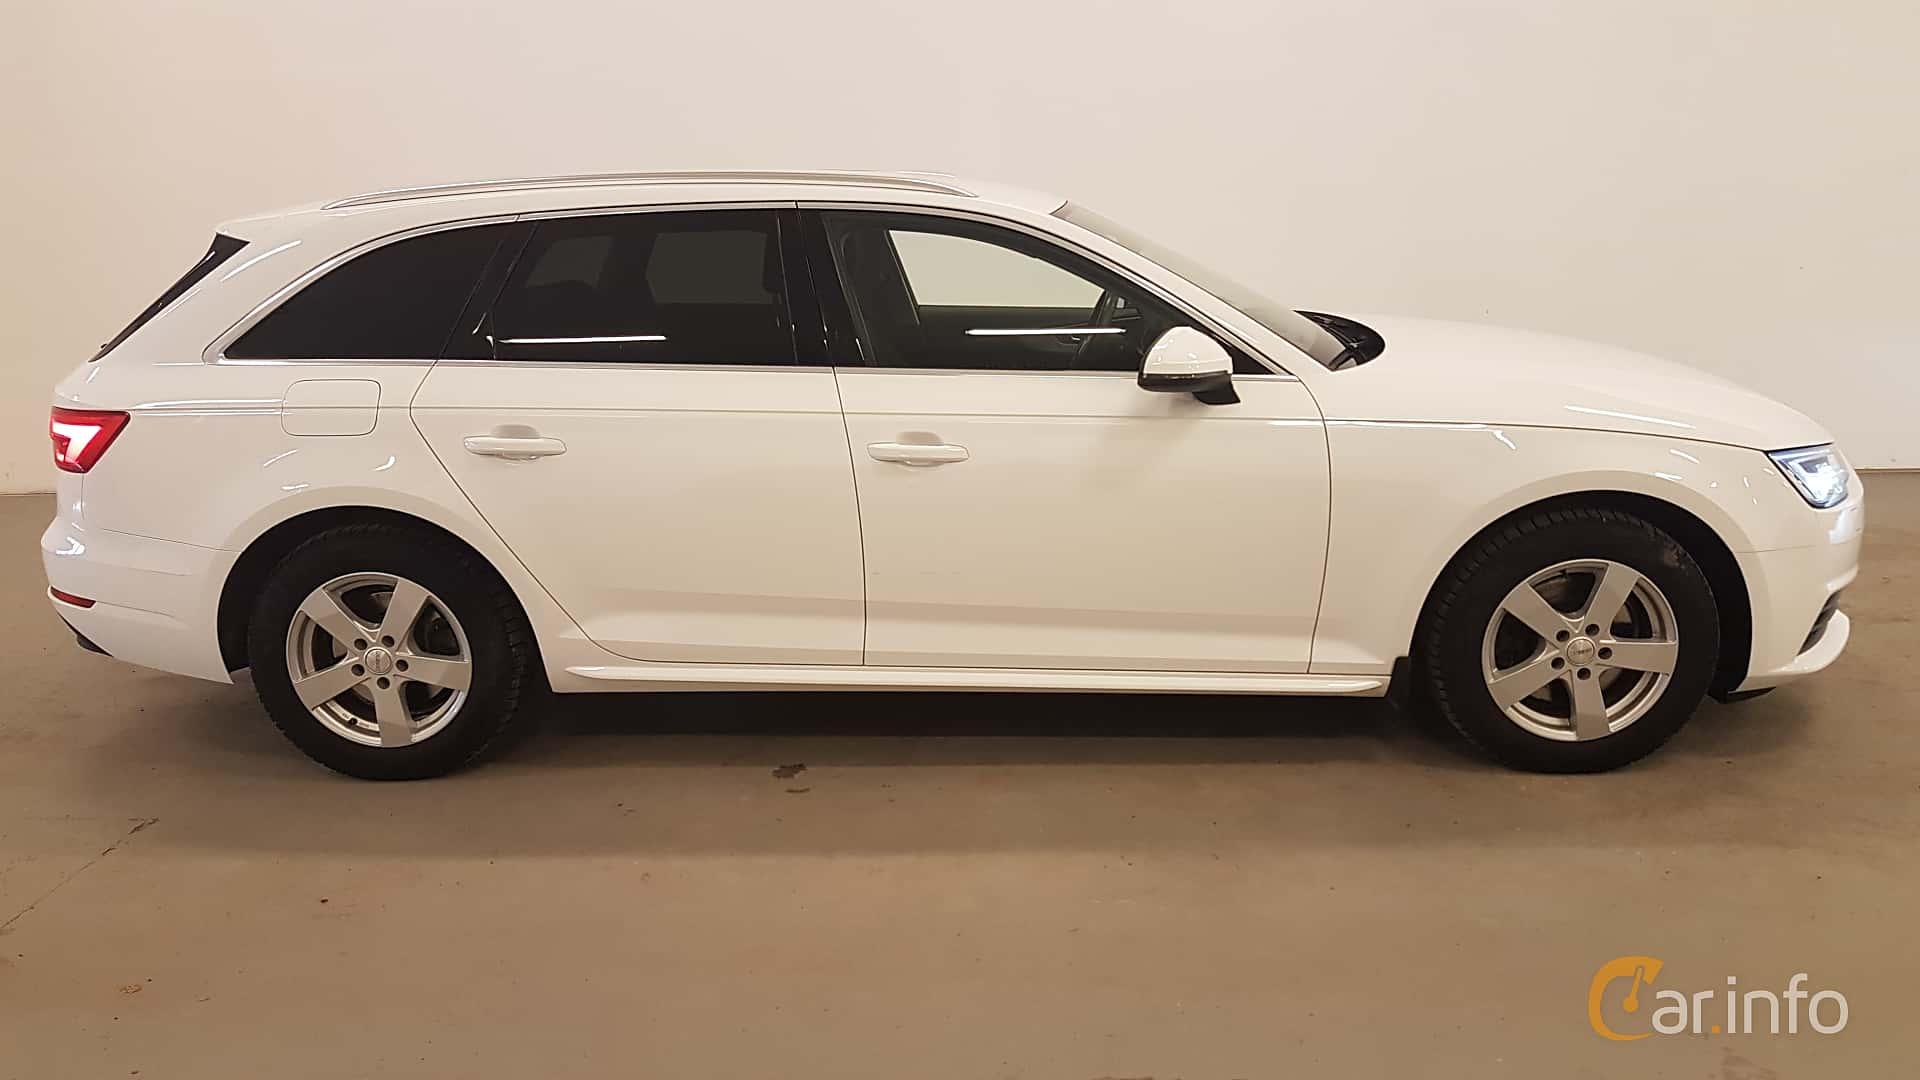 Audi A4 Avant Generation B9 20 Tdi